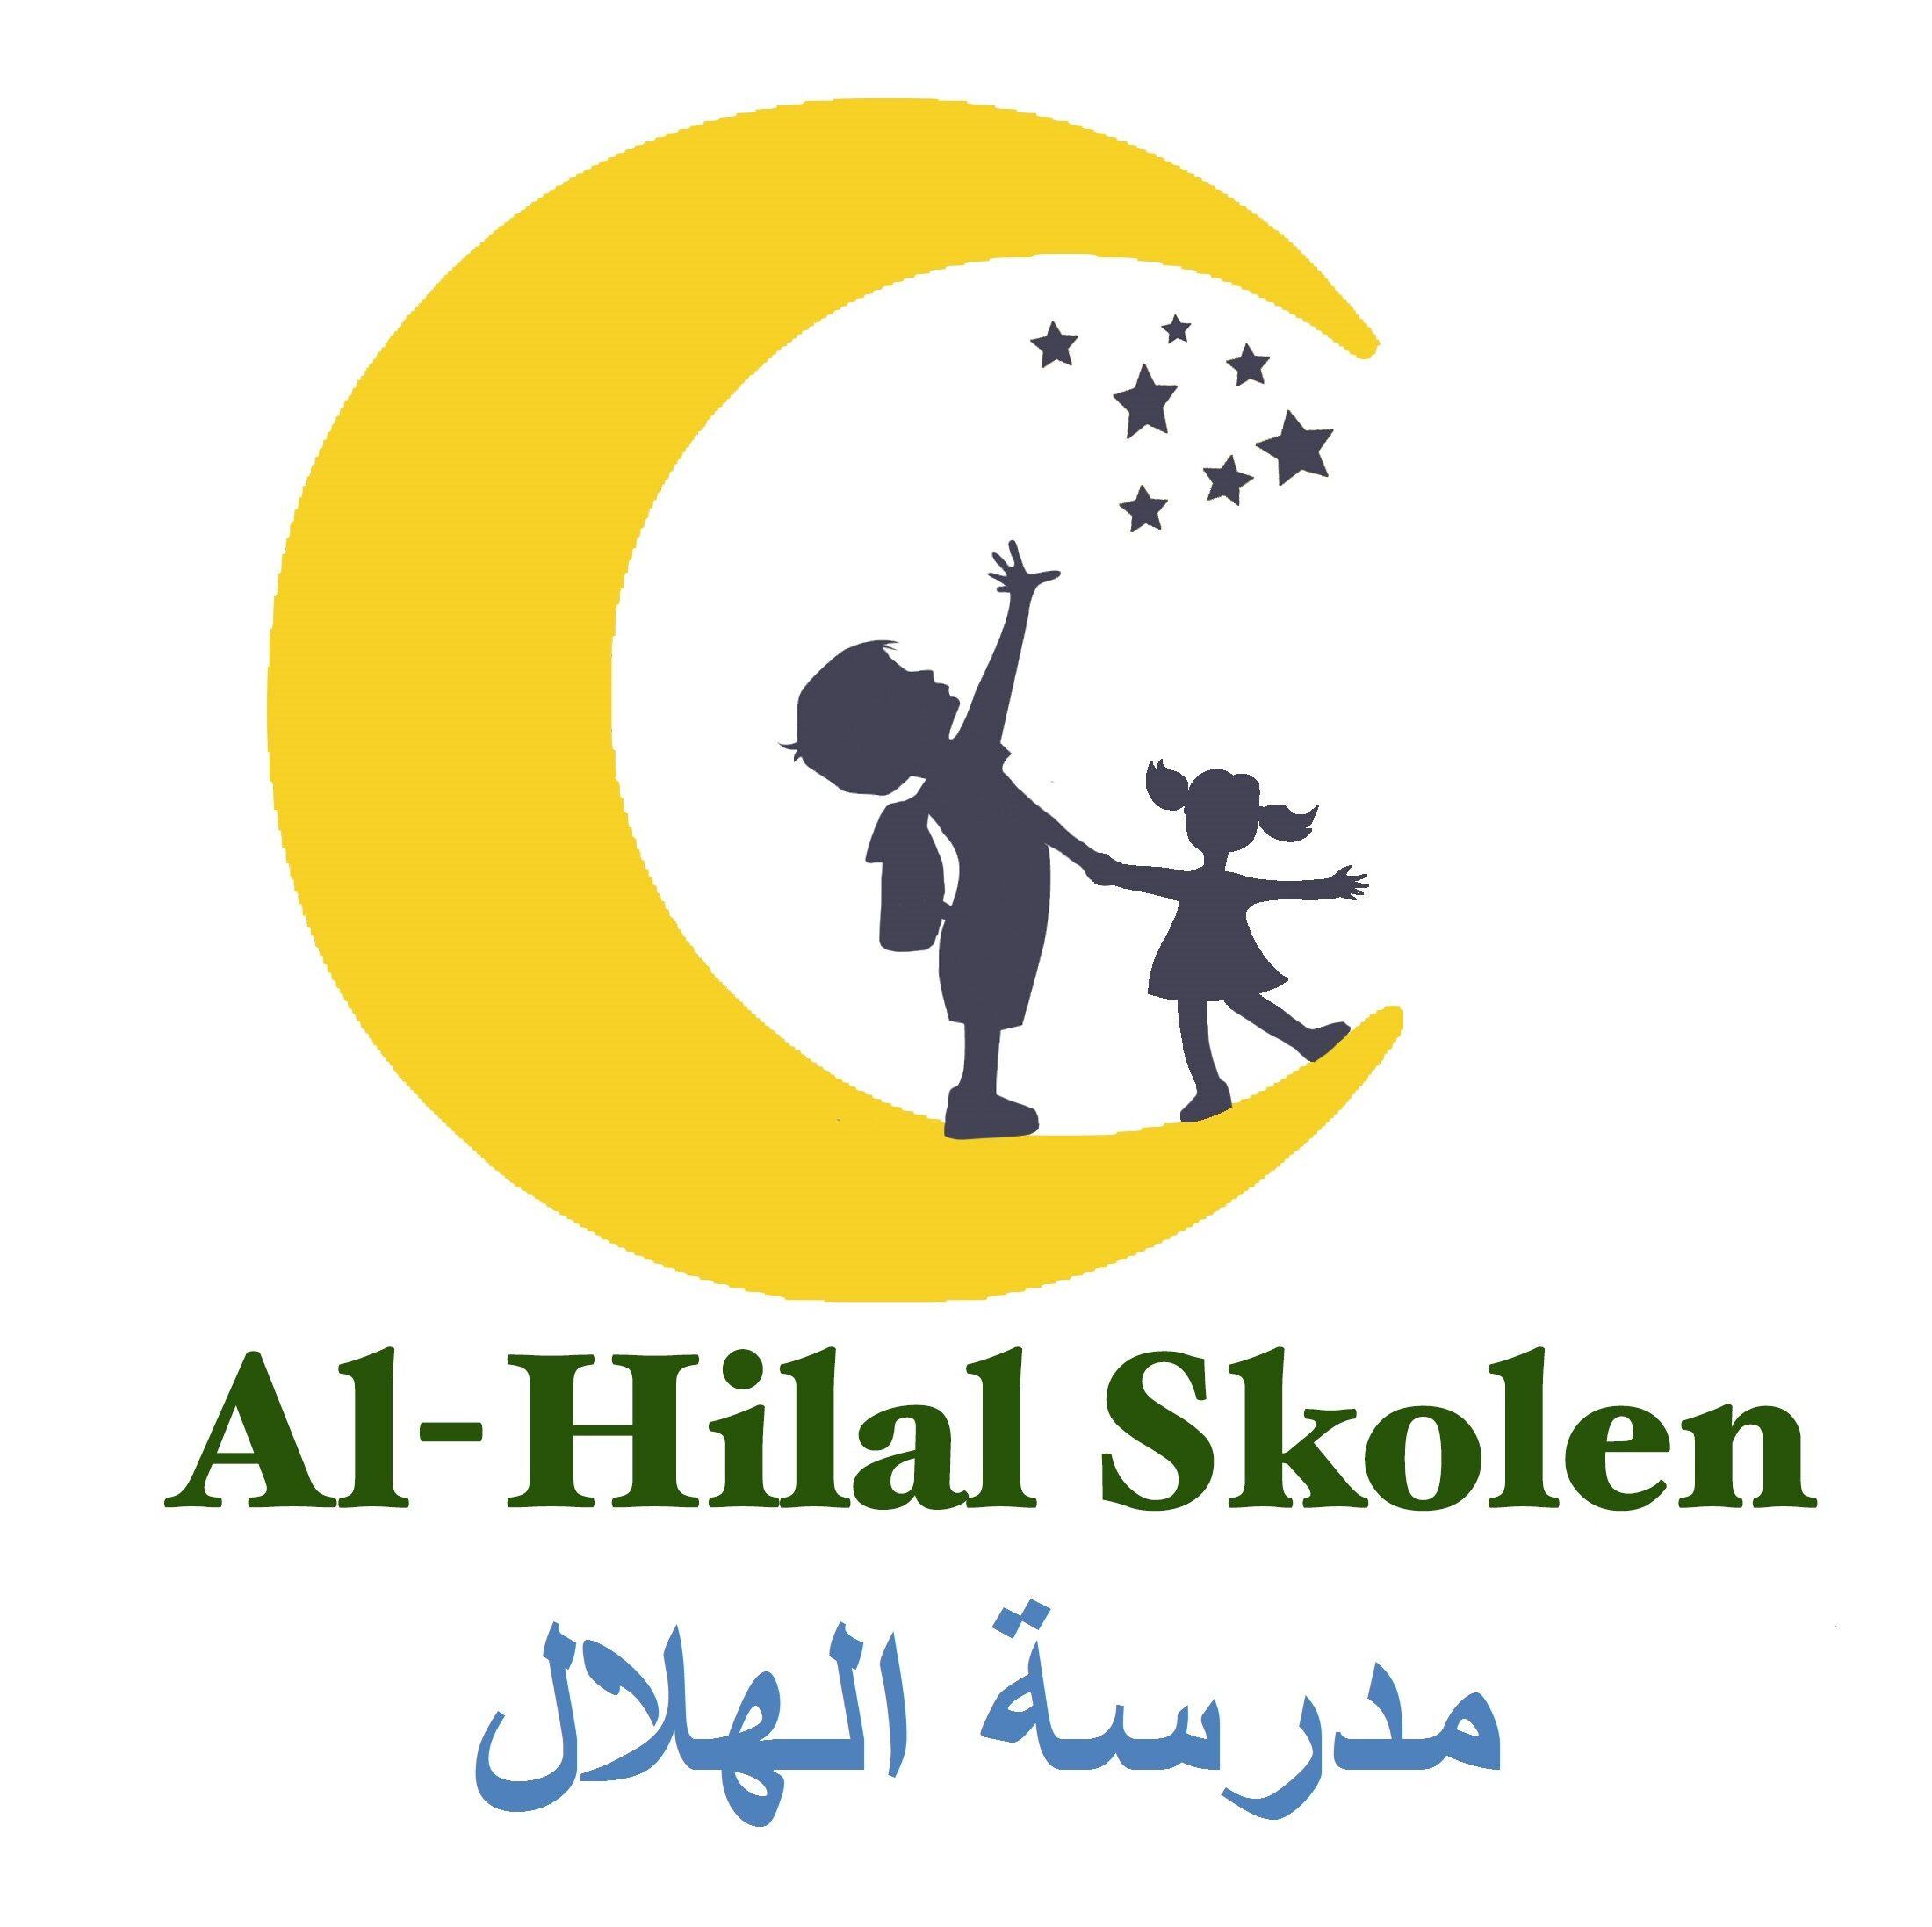 Al-Hilal Skolen